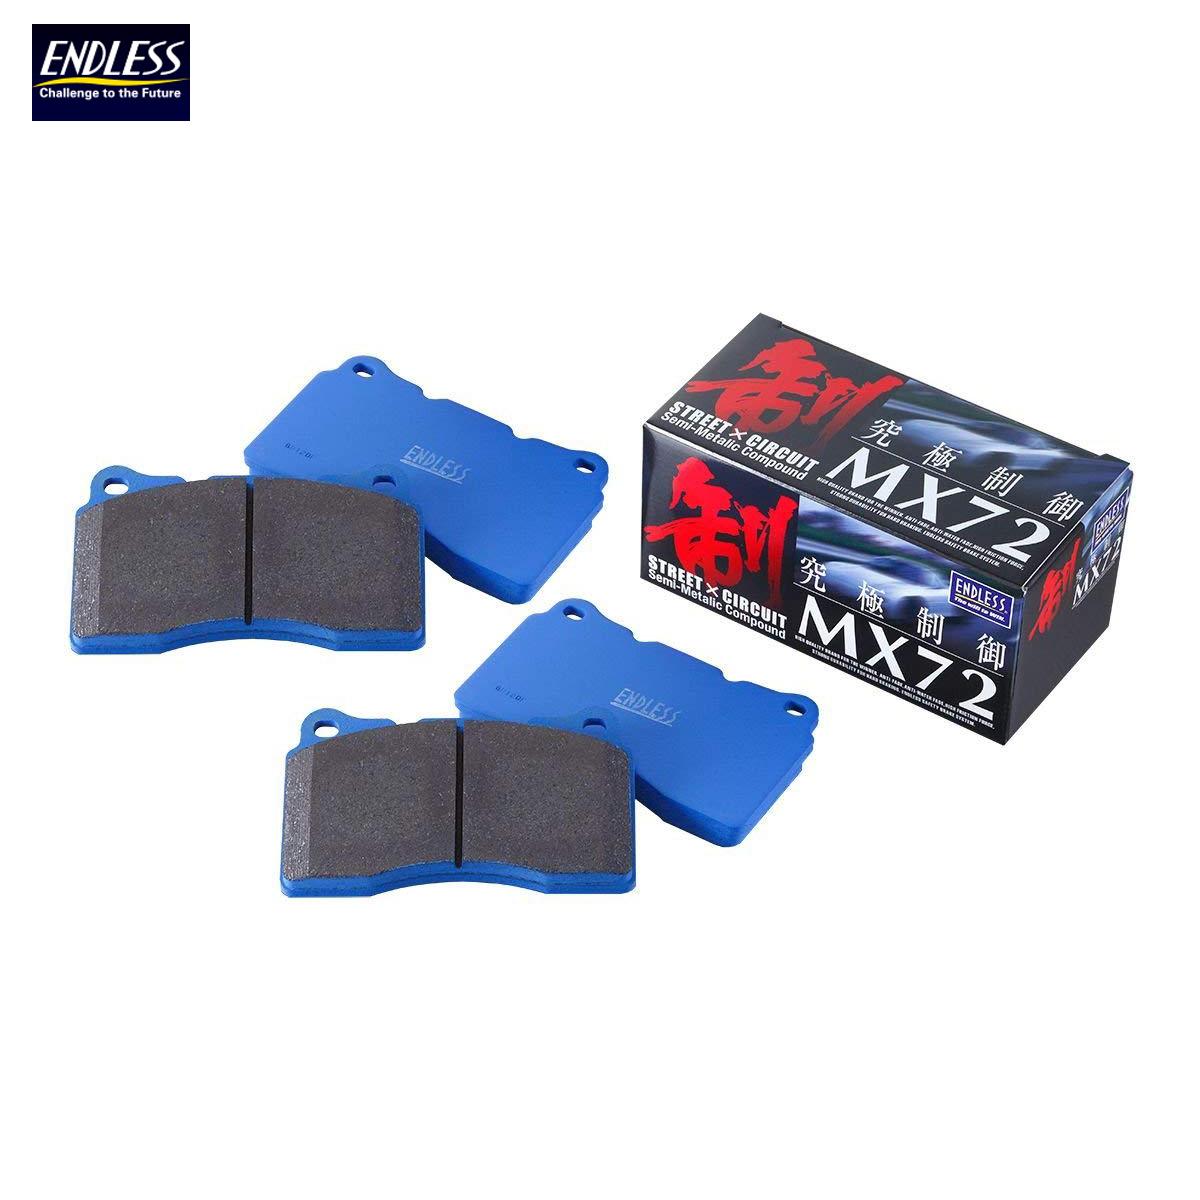 ENDLESS エンドレス ブレーキパッド MX72 フロント EP449 アリオン ZRT260 ZRT261 ZRT265